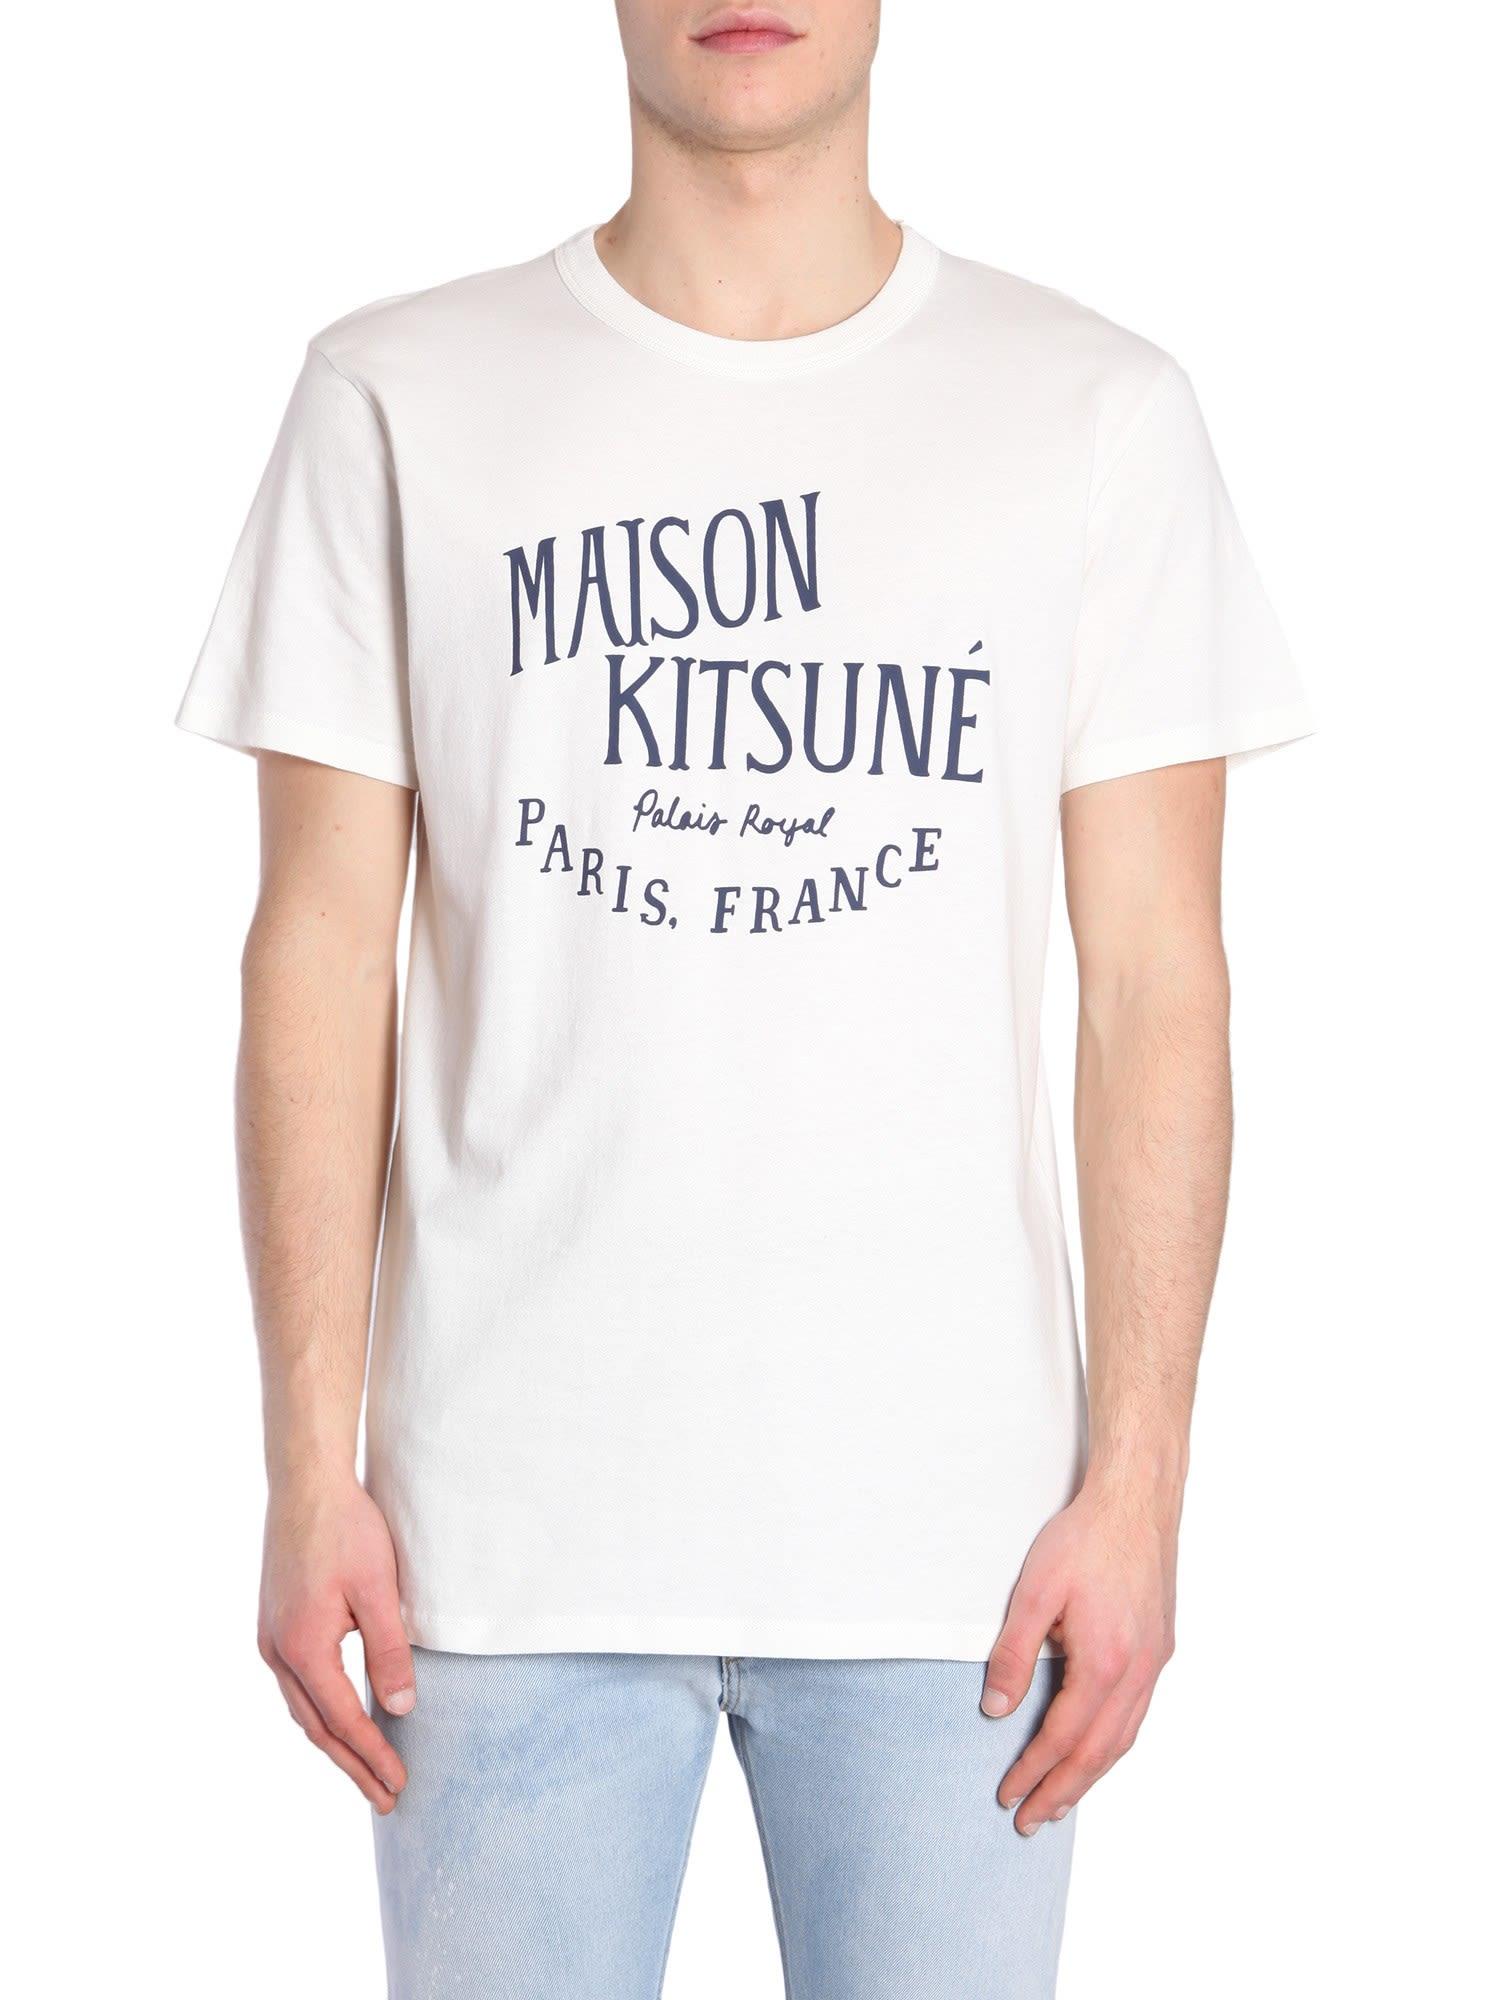 Maison Kitsuné Round Collar T-shirt